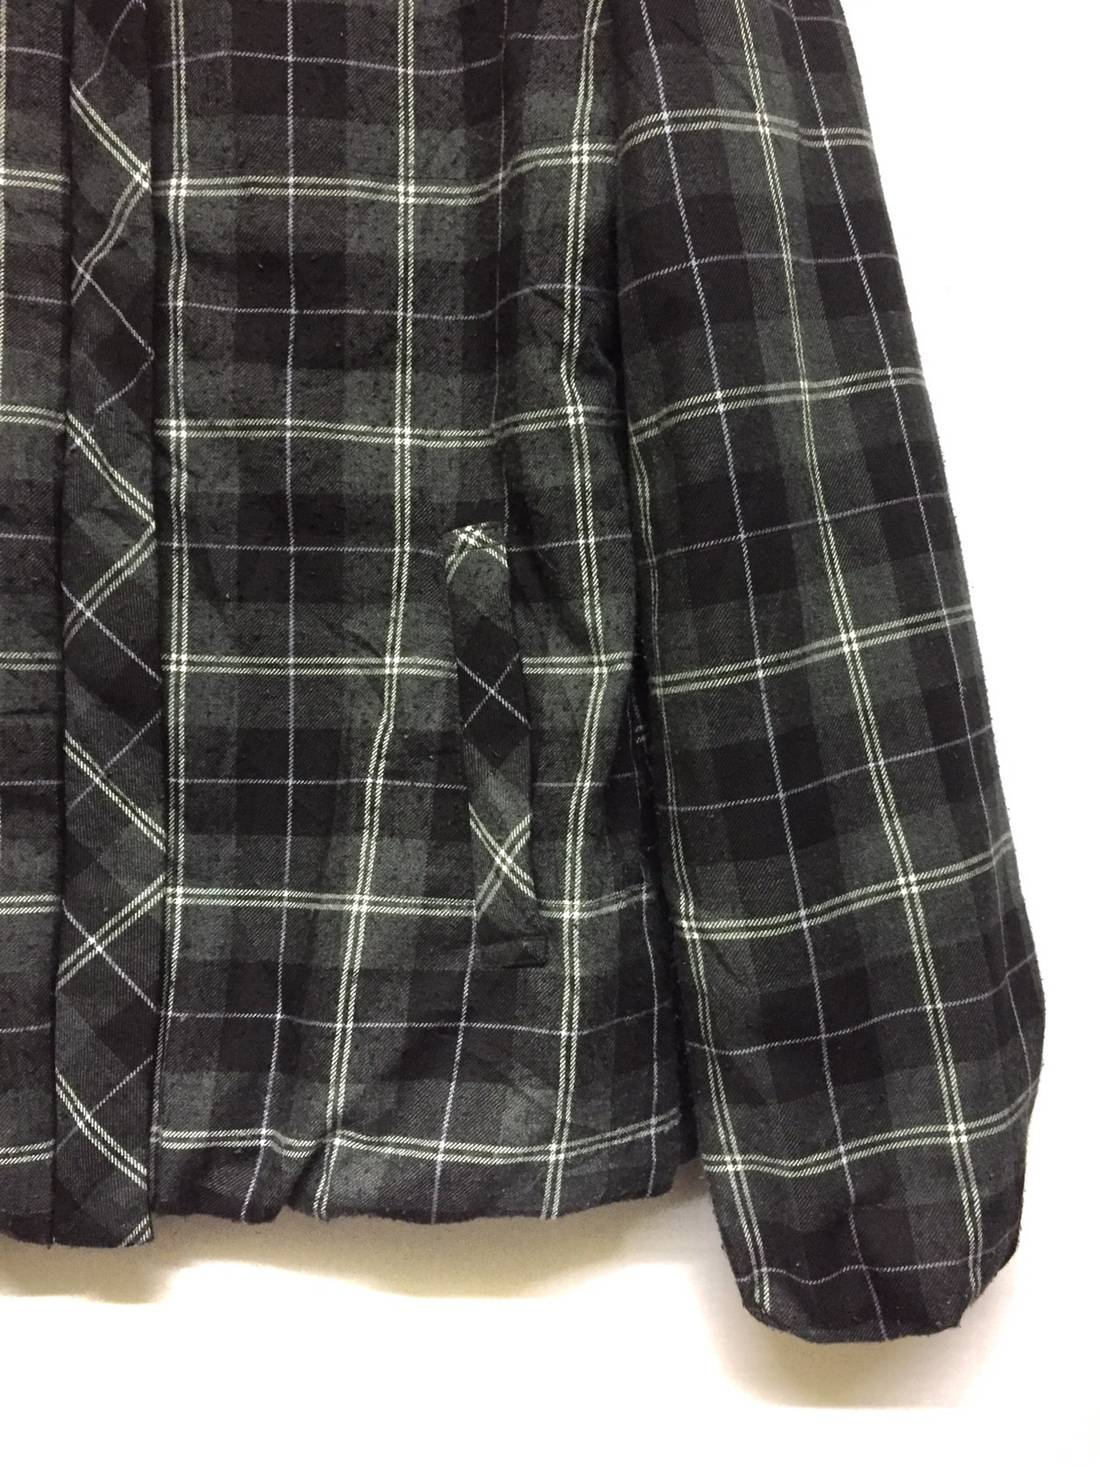 Adidas para Adidas Neo Plaid Tartan Checkered Checkered Paded Paded Down Jacket para niños 34c70c2 - sfitness.xyz